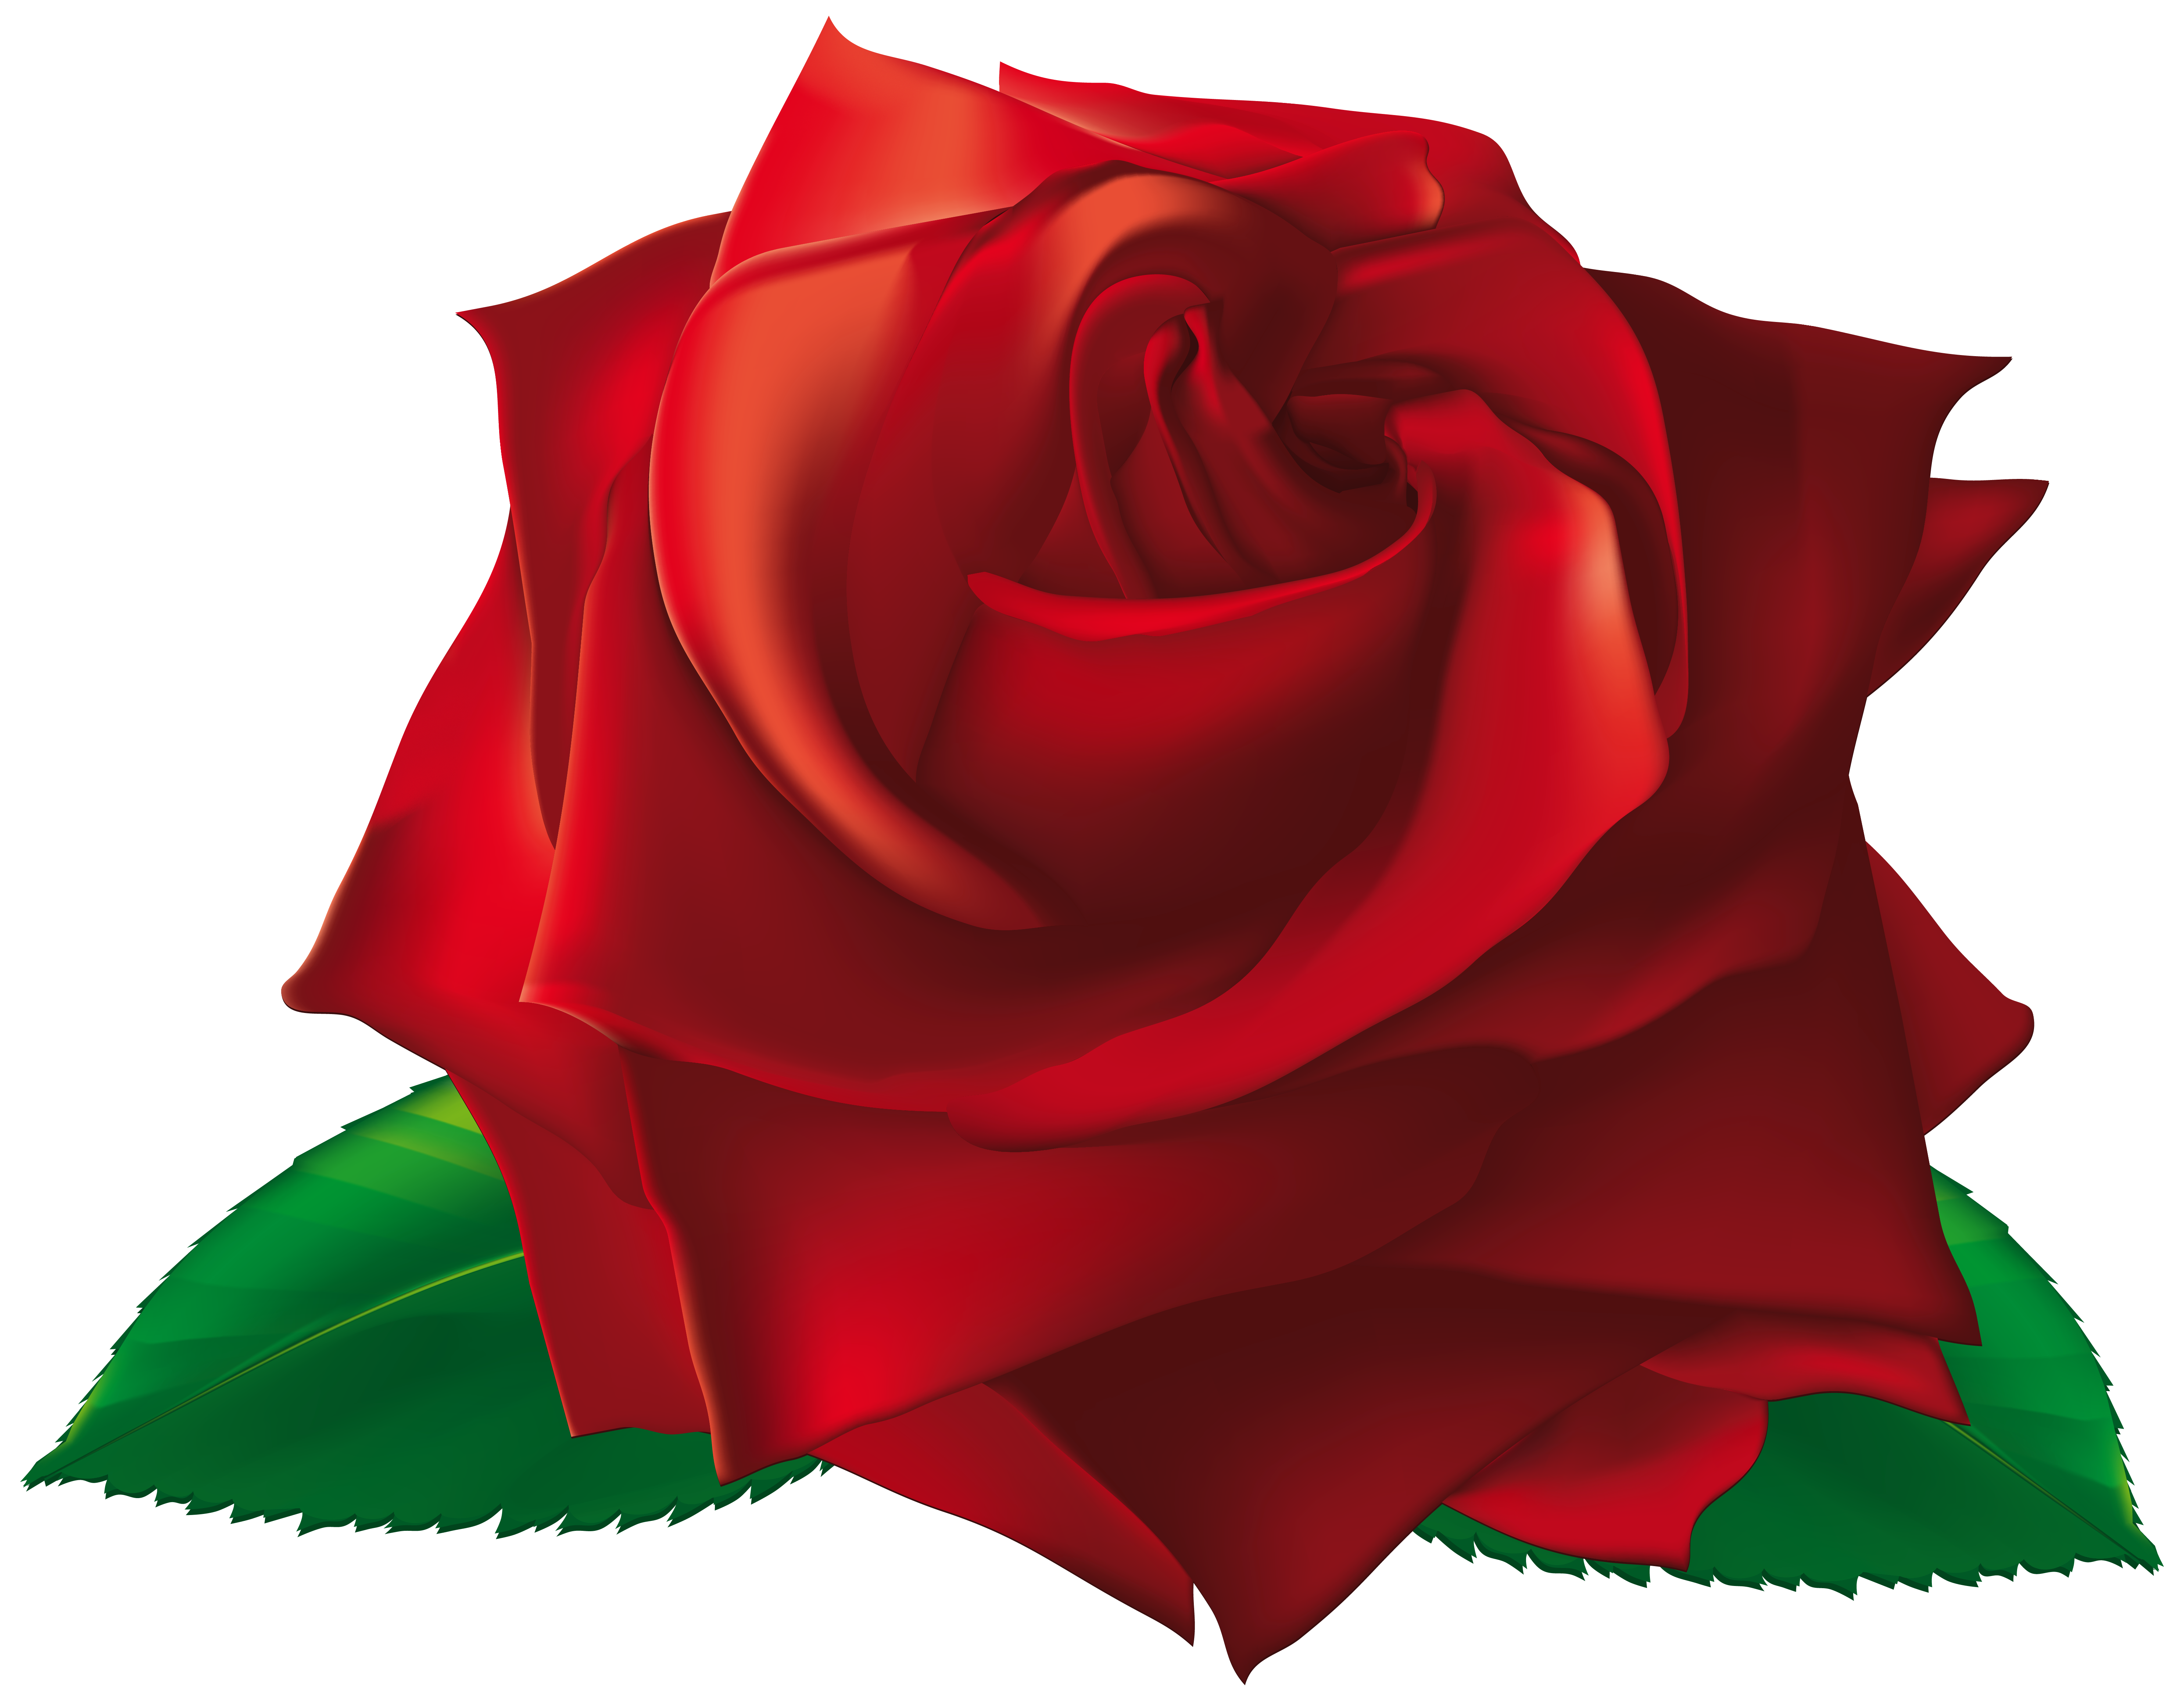 Red single rose.